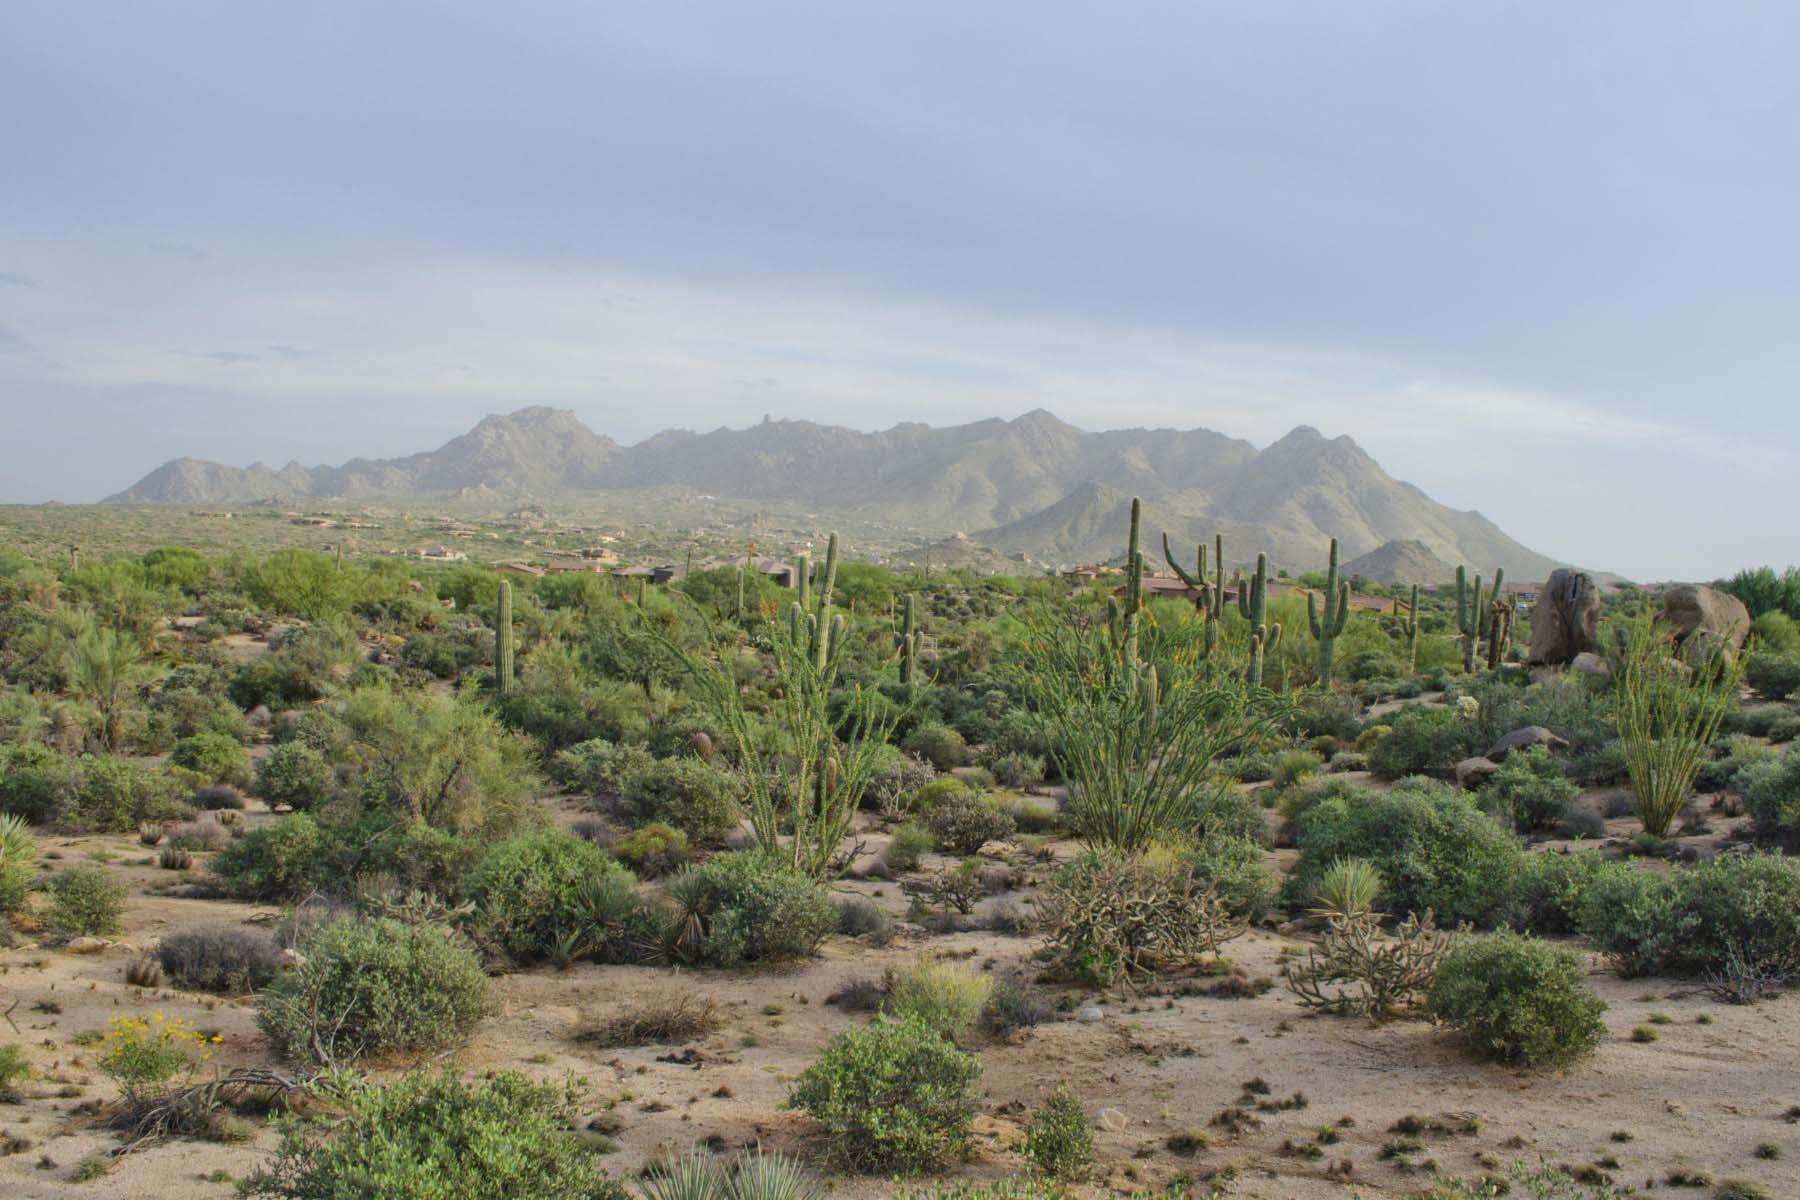 Đất đai vì Bán tại Signature homesite in gated Yearling Estates. 26125 N 116TH ST #1 Scottsdale, Arizona 85255 Hoa Kỳ